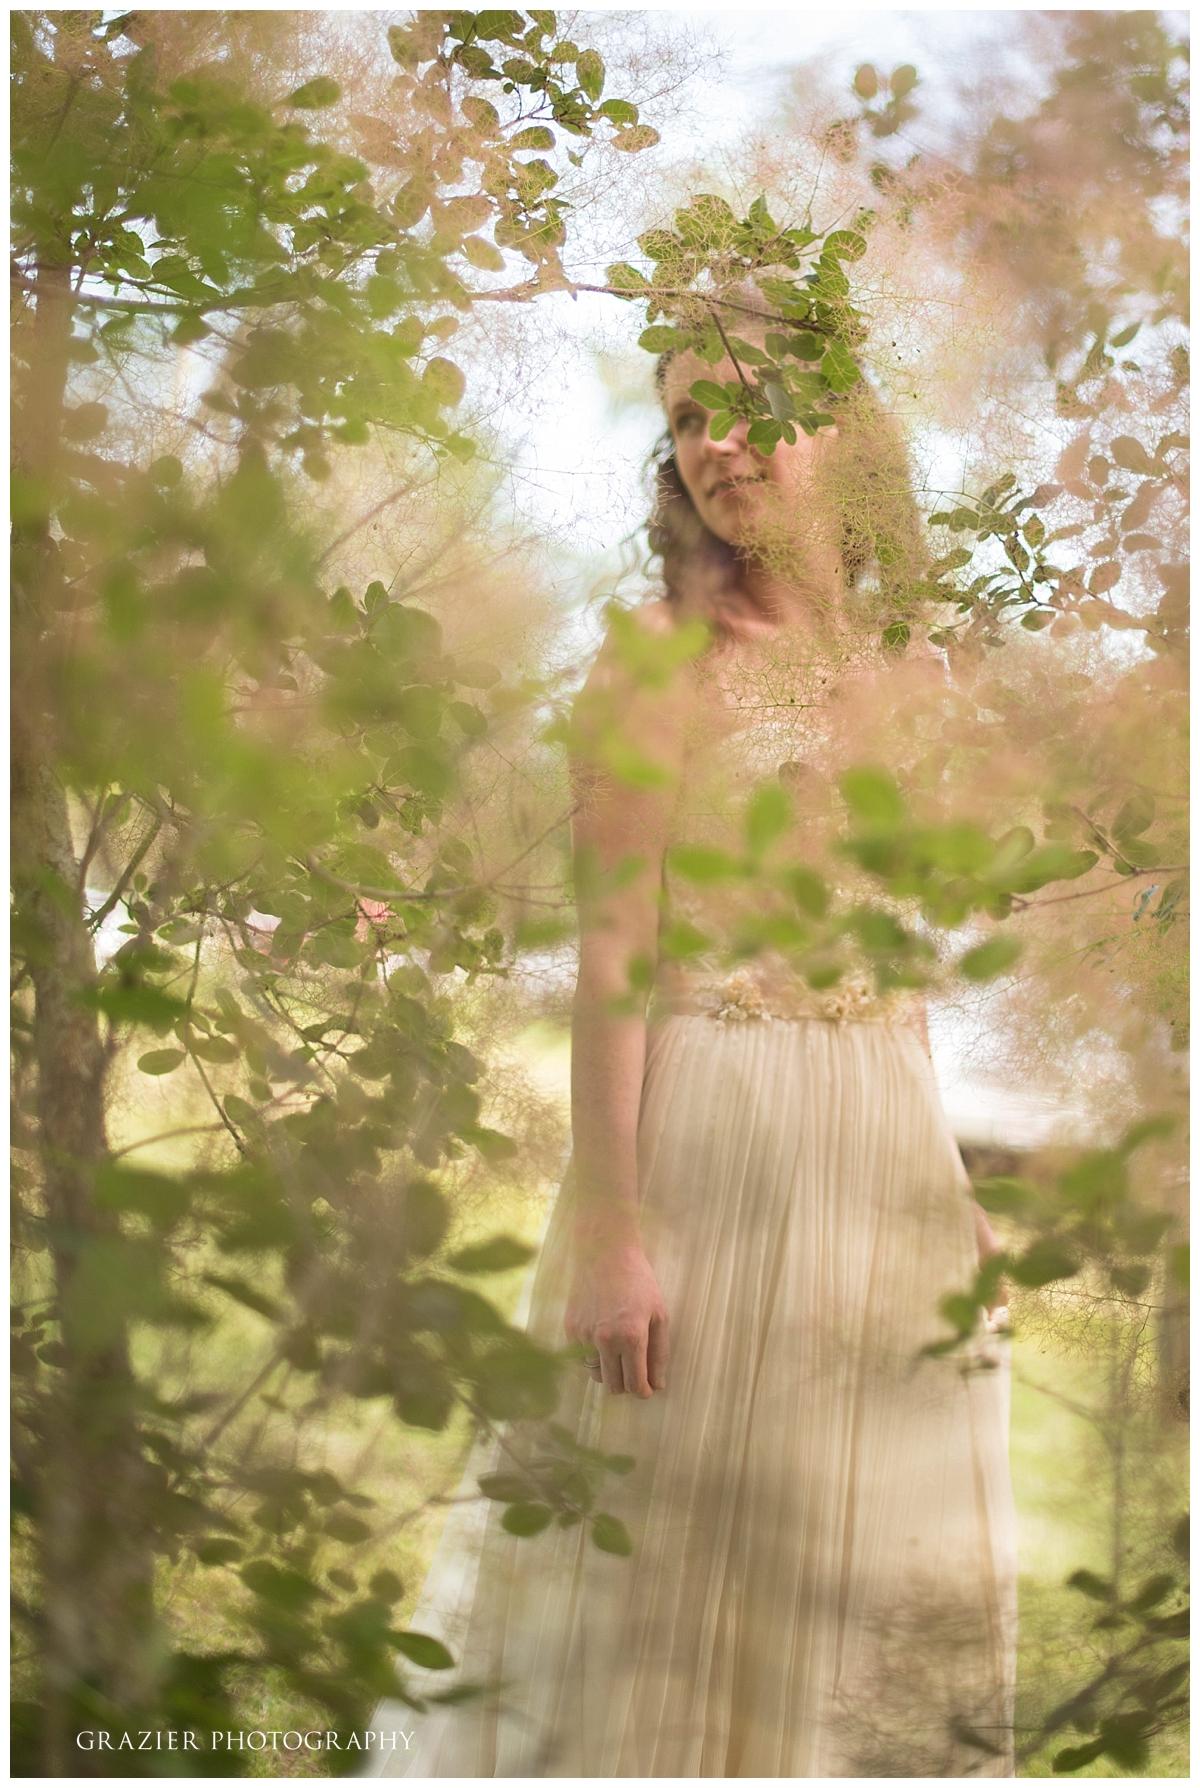 Tyrone Farm Wedding Grazier Photography 2017-46_WEB.jpg